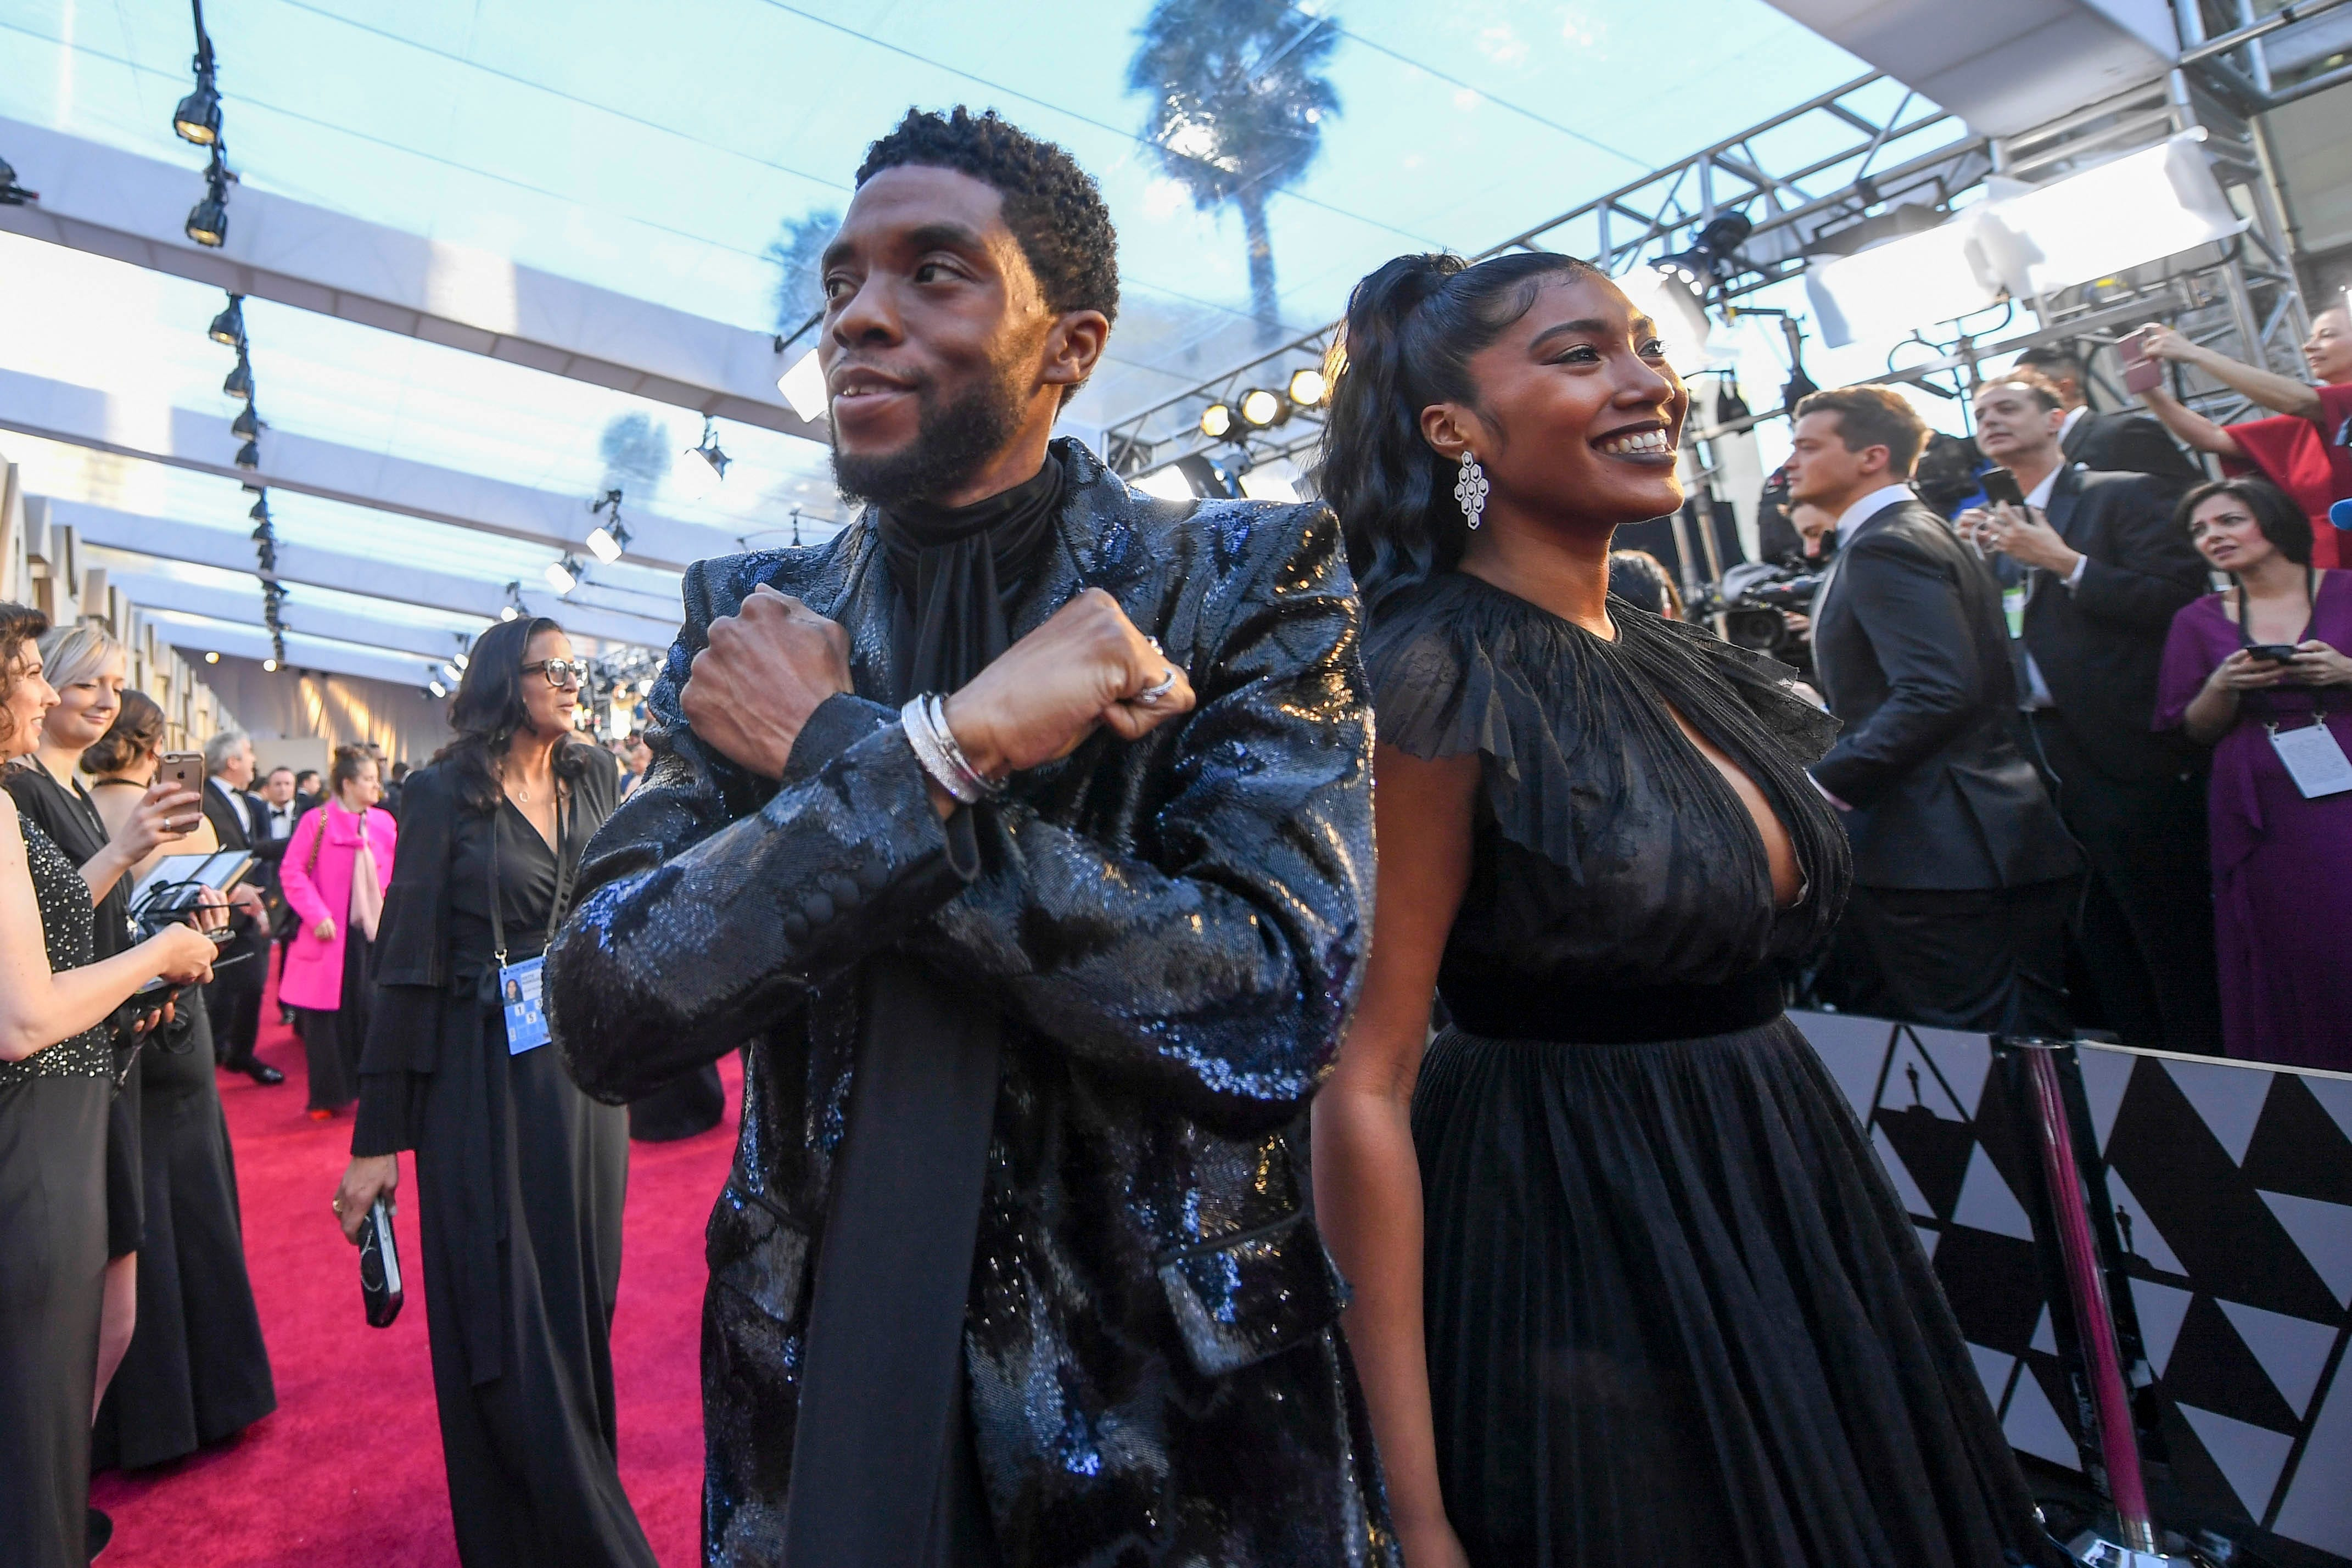 February 24, 2019; Los Angeles, CA, USA; Chadwick Boseman arrives at the 91st Academy Awards at the Dolby Theatre. Mandatory Credit: Robert Hanashiro-USA TODAY NETWORK (Via OlyDrop)